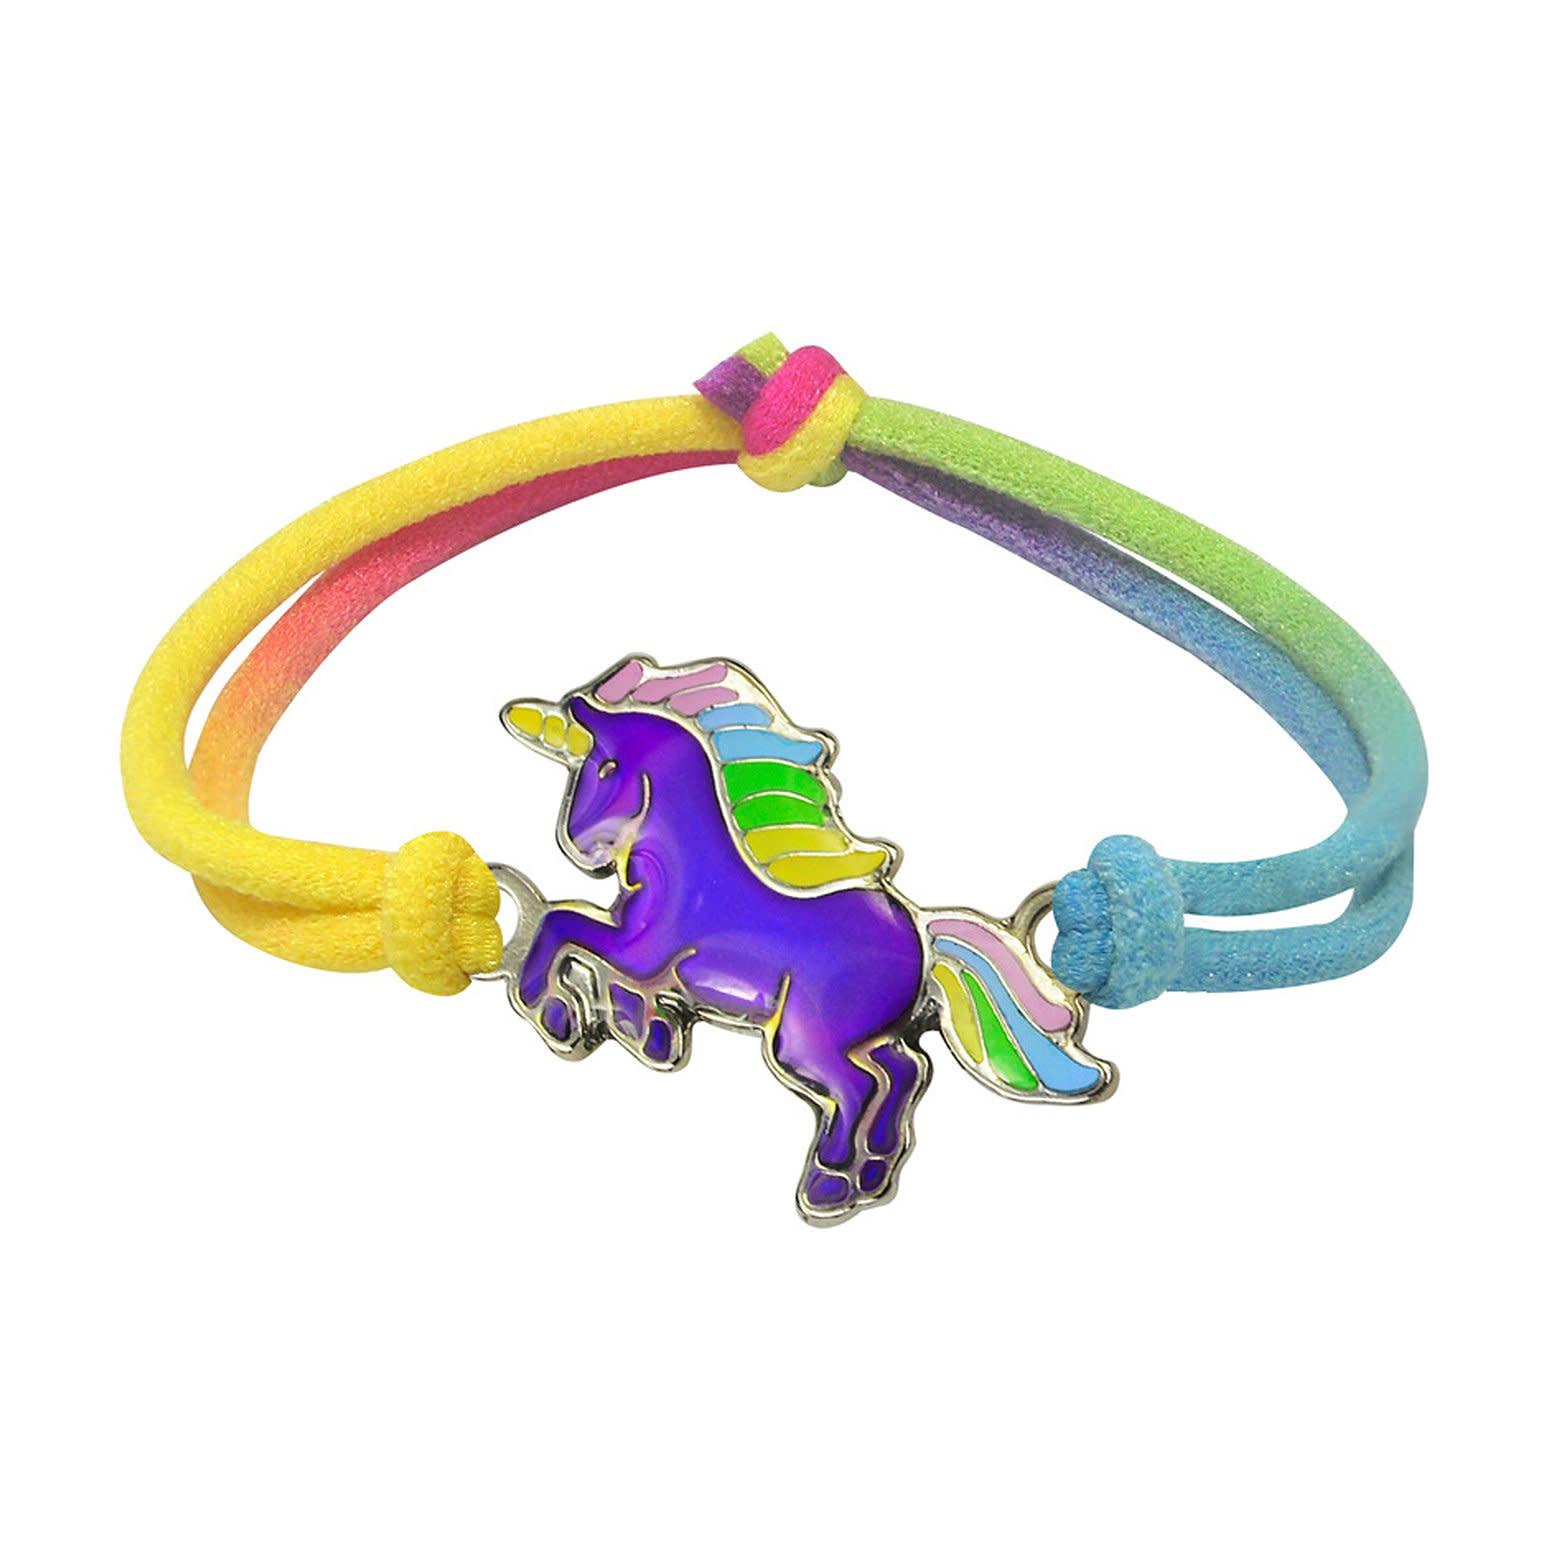 AWST Bracelet - Rearing Unicorn, Color Changing